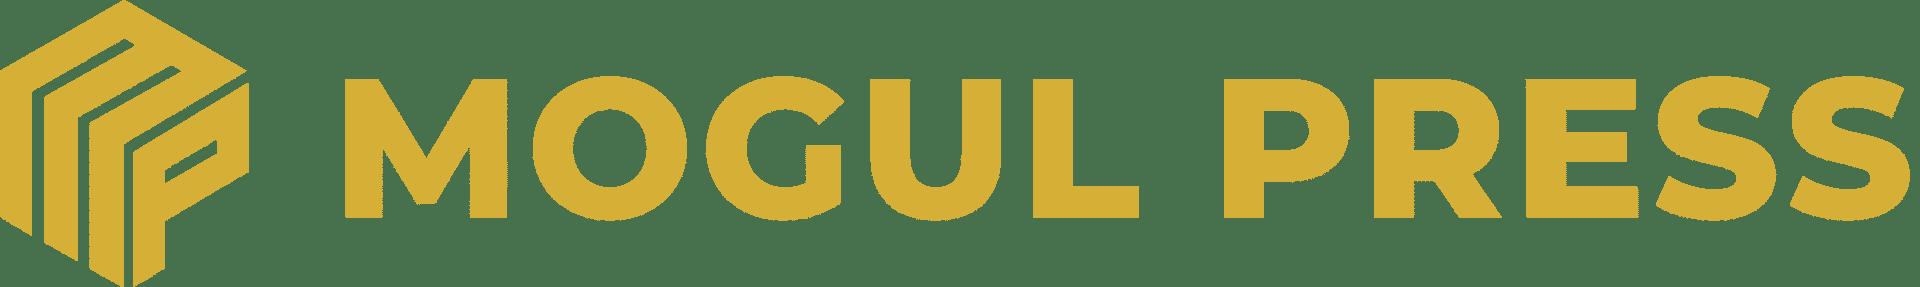 Mogul Press